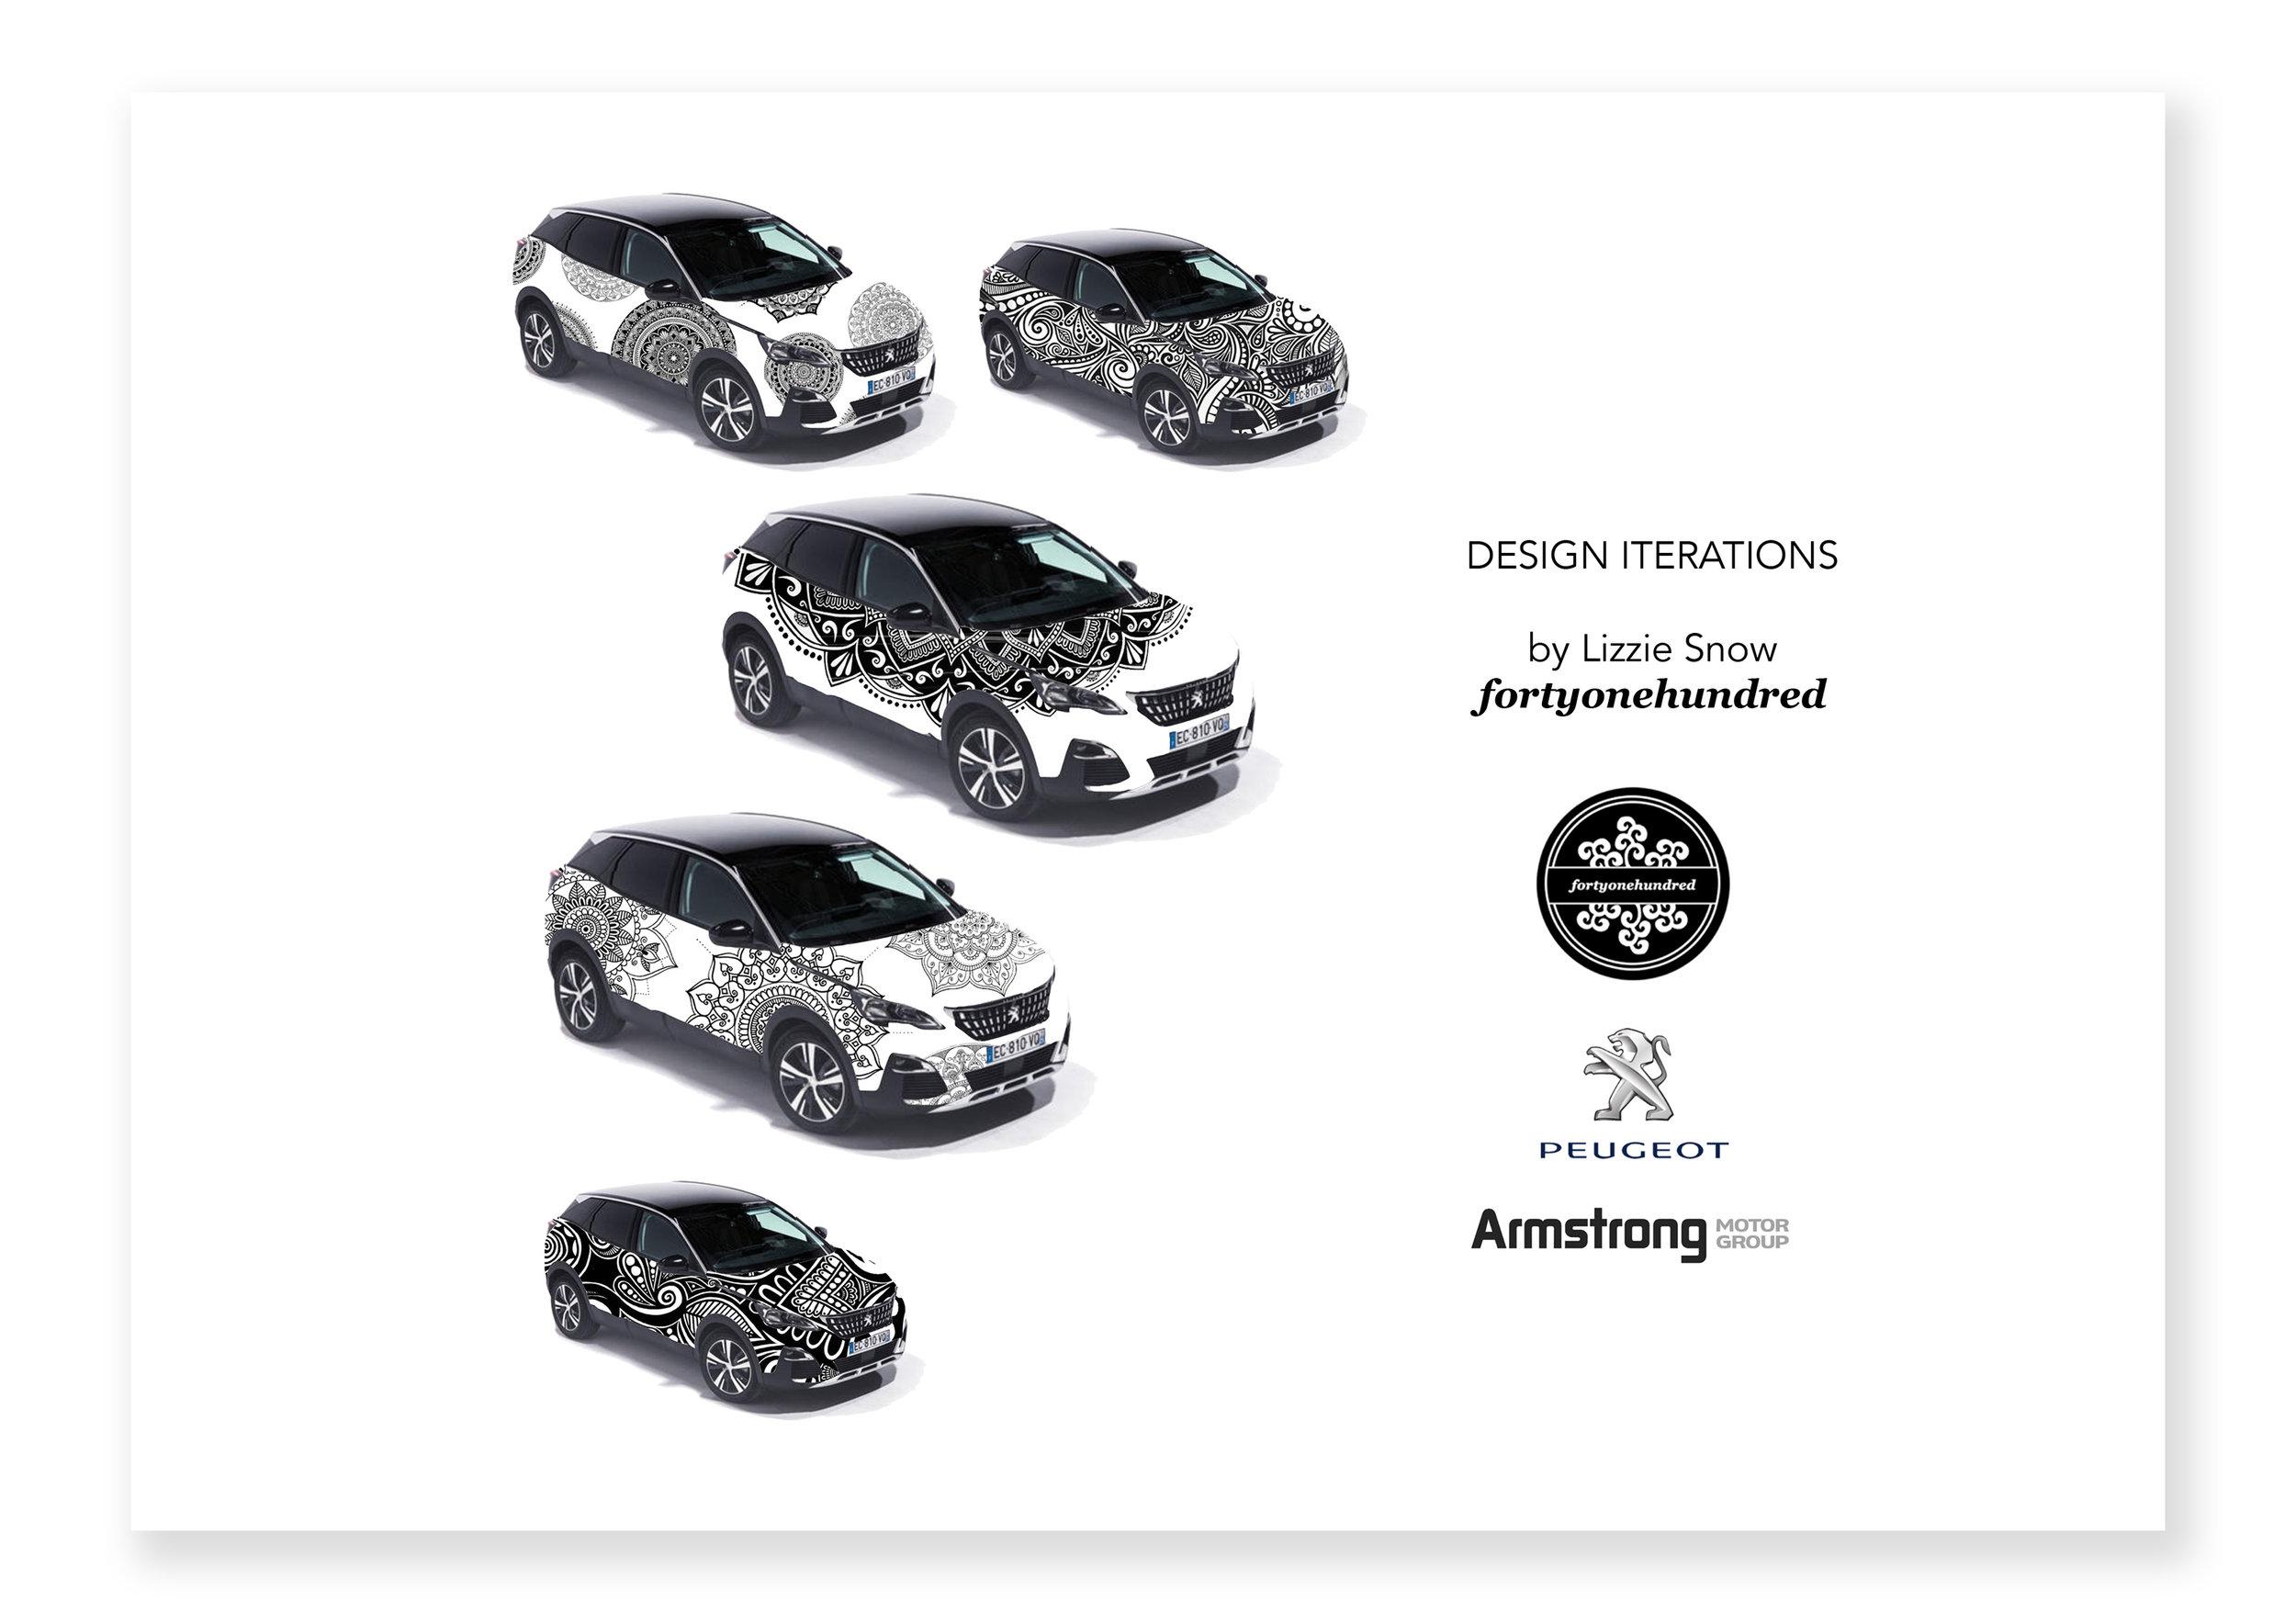 peugeotXfortyonehundred-design-iterations3.jpg